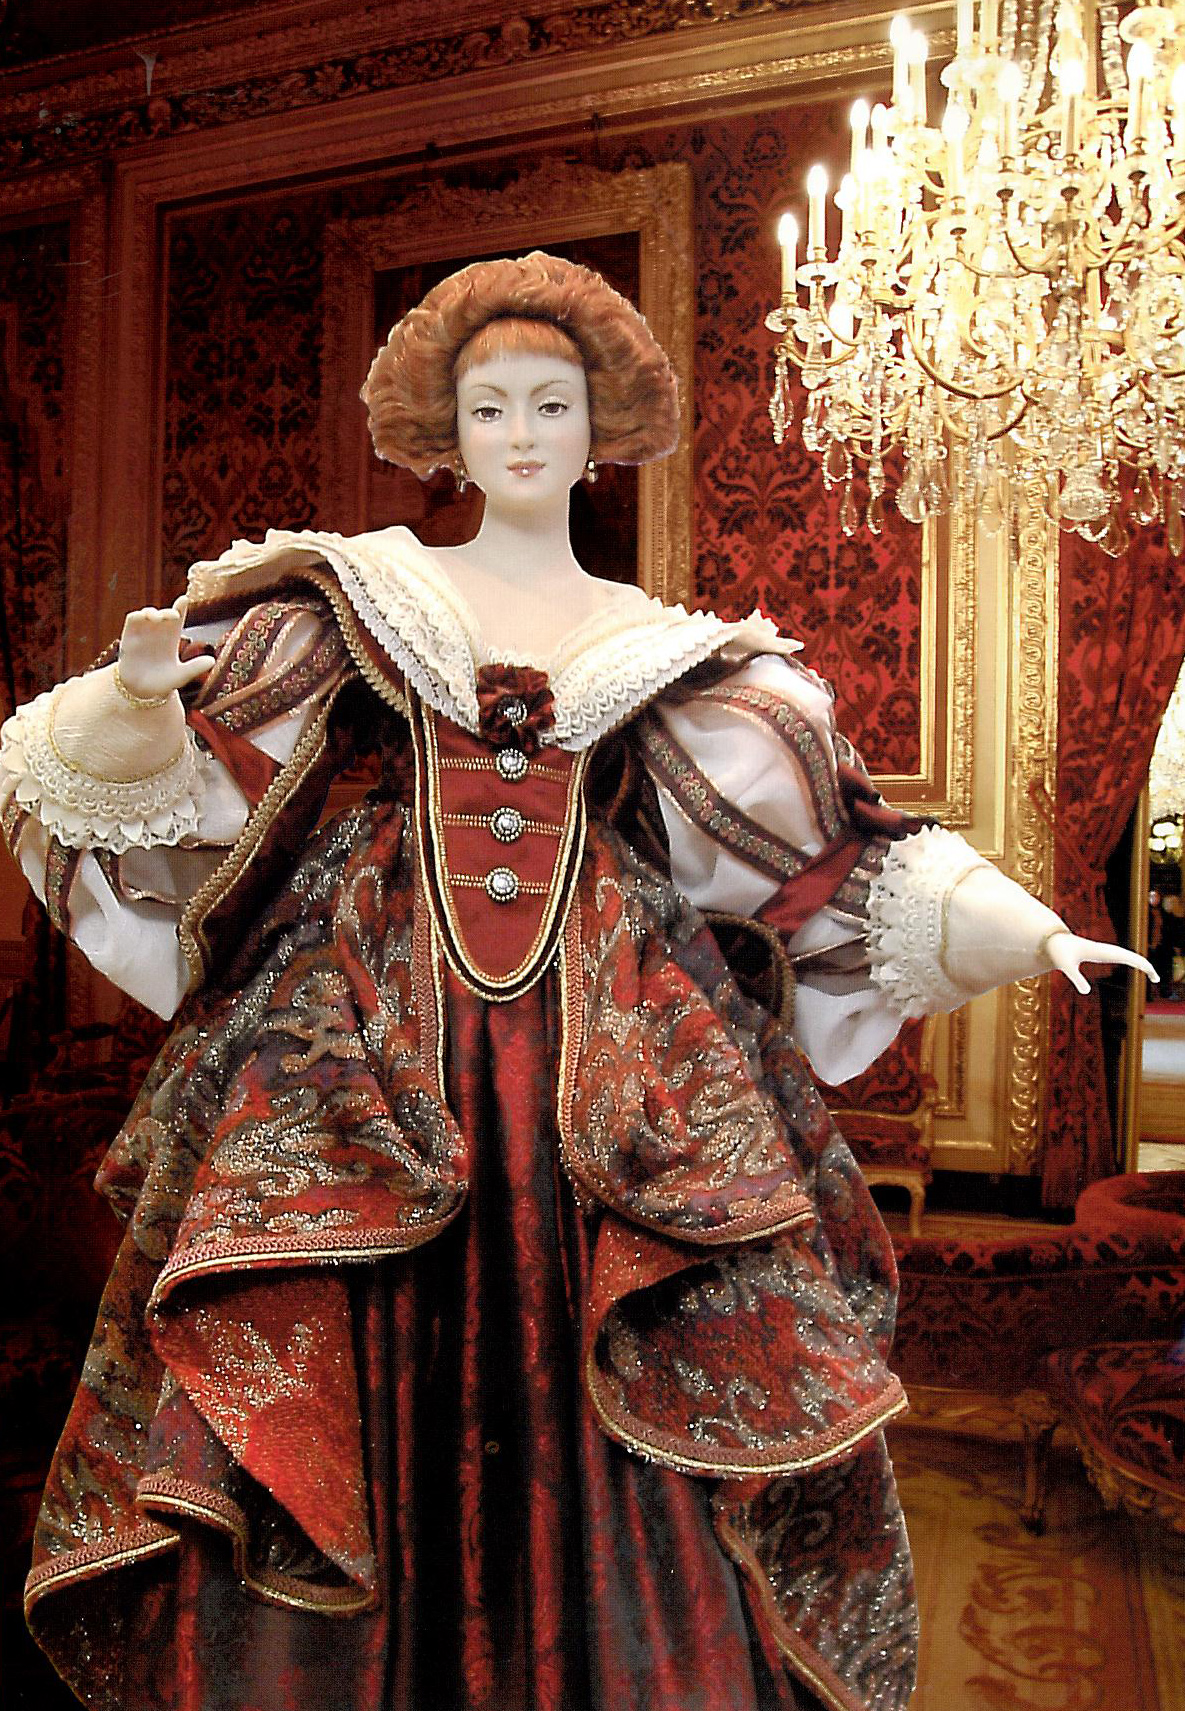 """Знатная дама двора Людовика XIII"" 77,8 см. Керамика, фарфор, текстиль."